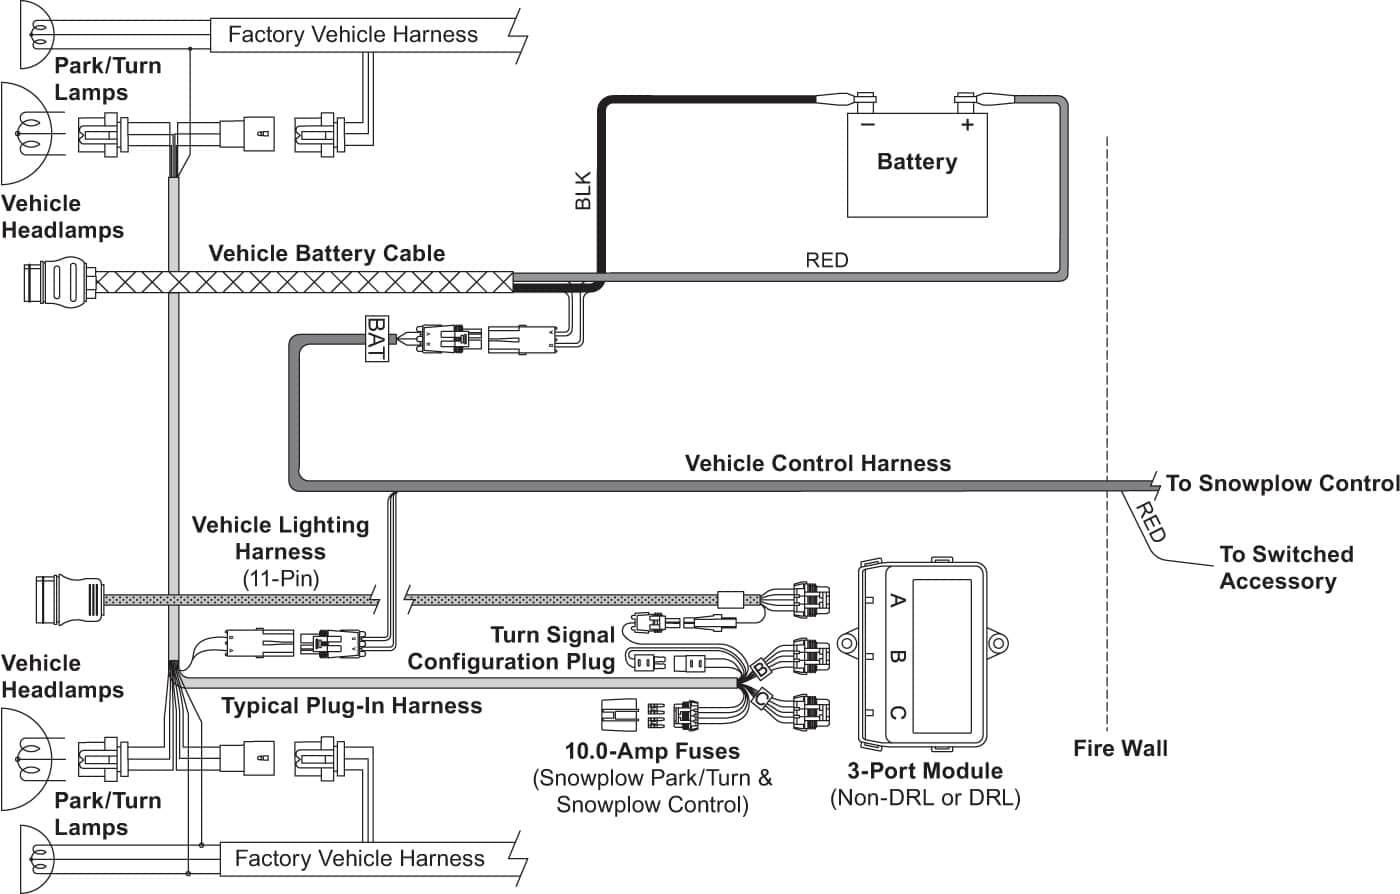 hight resolution of snow way wiring diagram wiring diagram dat sno way plow solenoid wiring snoway wiring diagram